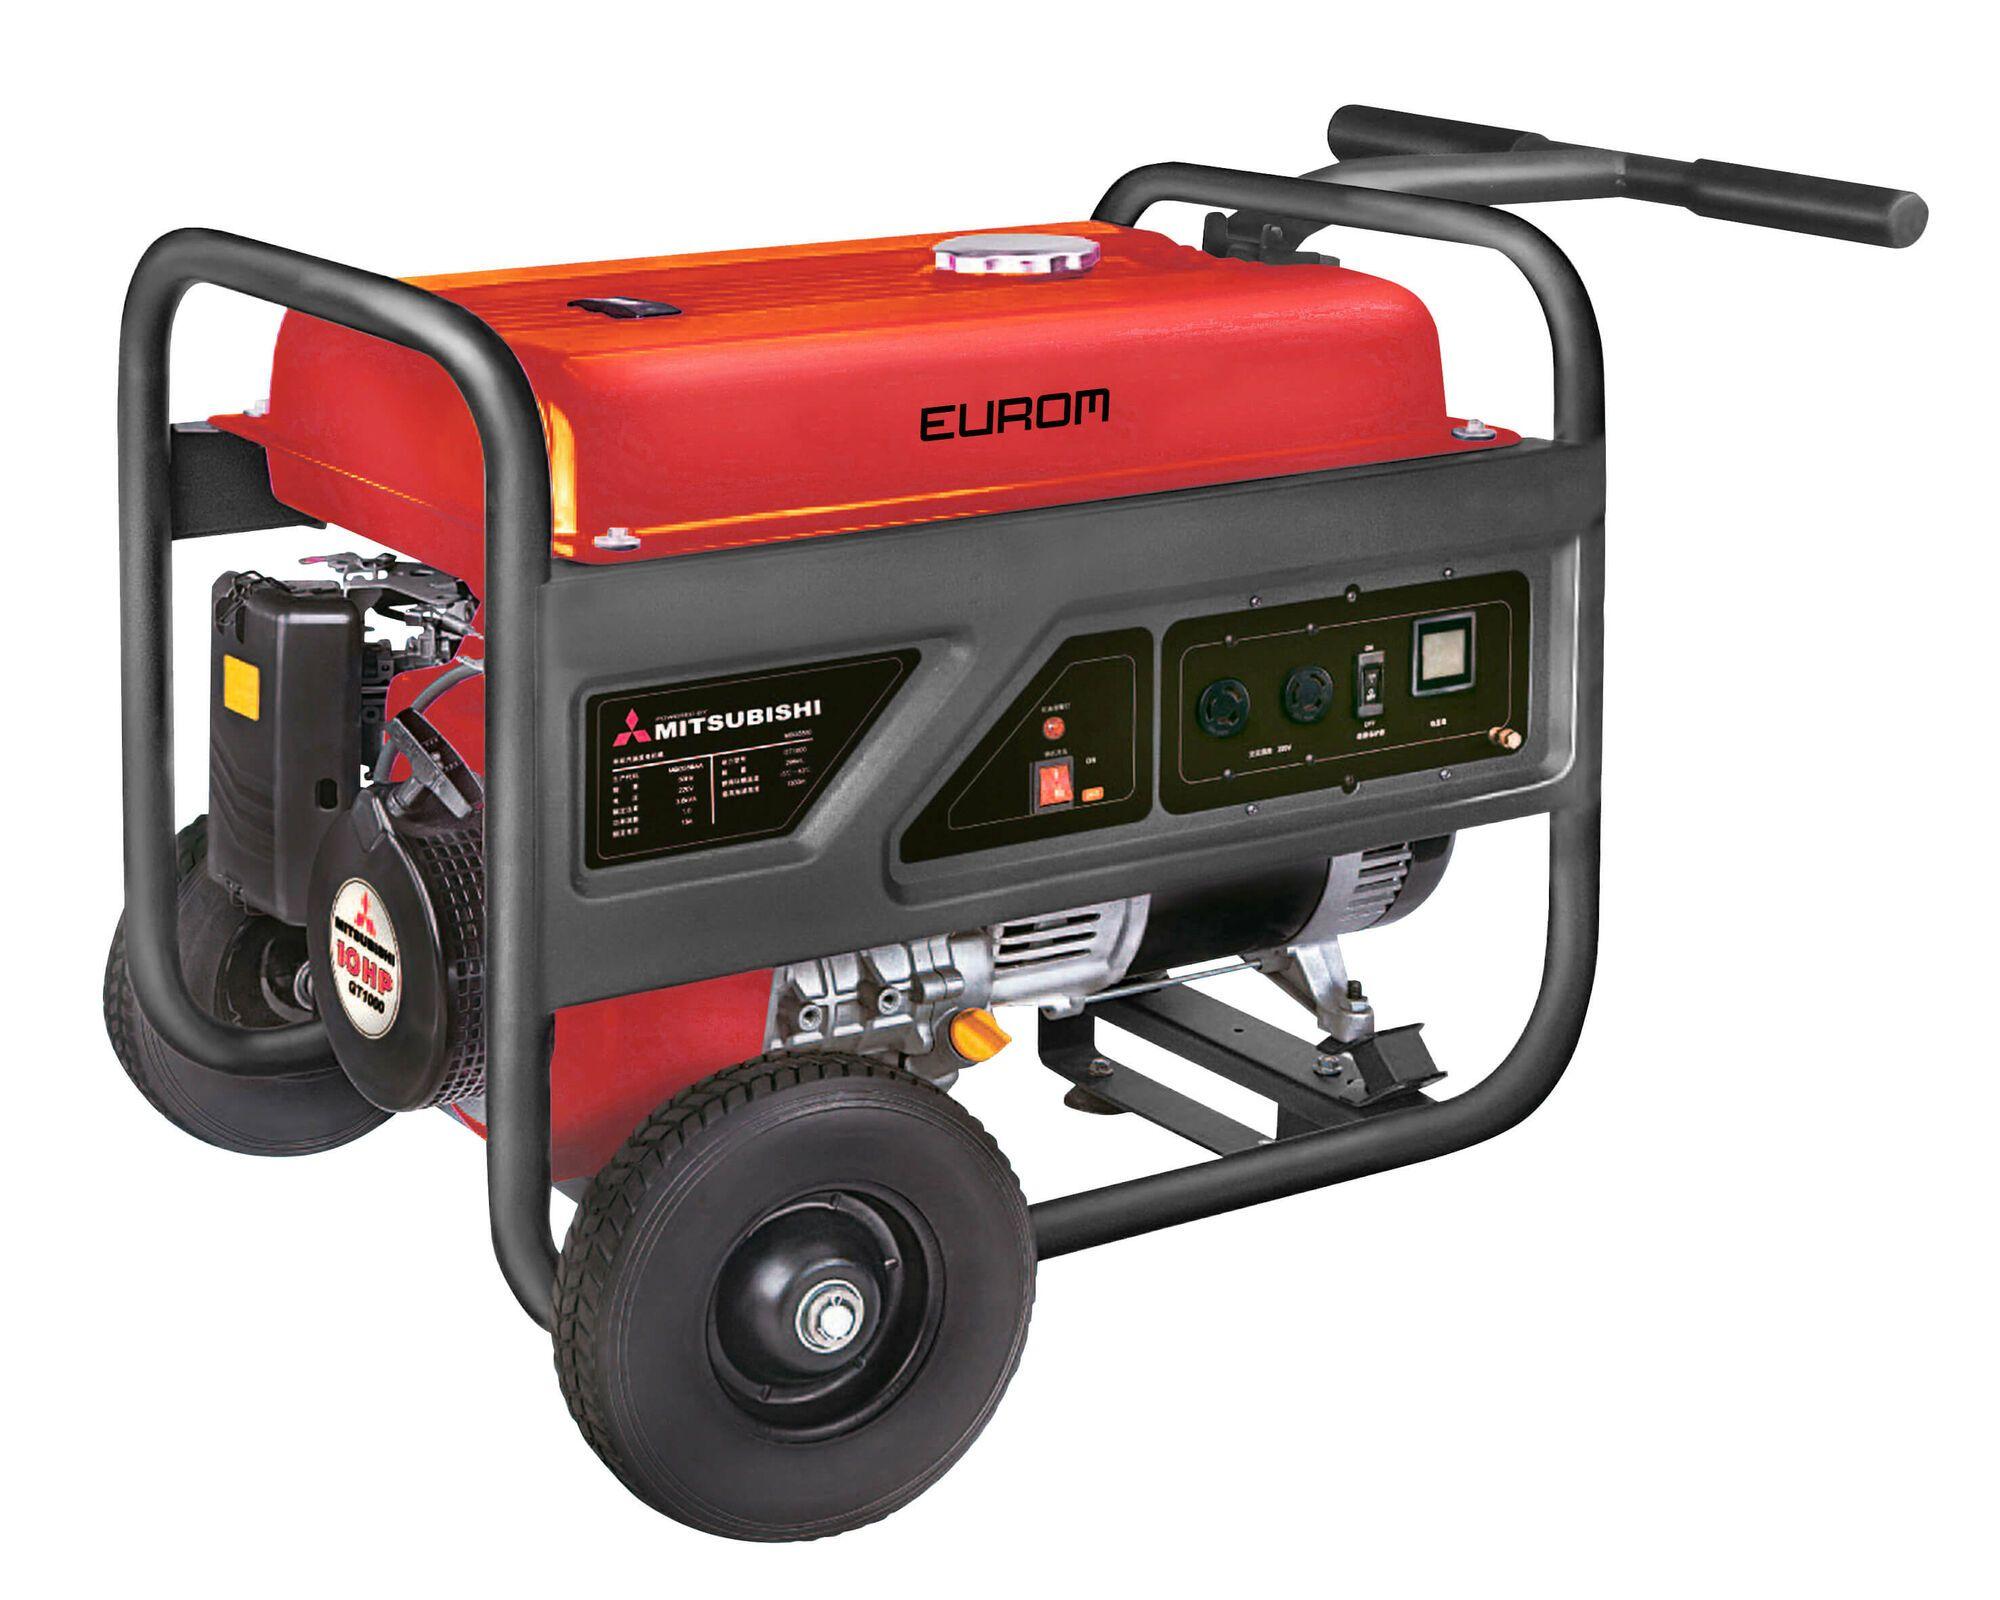 Eurom MM5500 Benzine generator 3.360W | Aggregaat 4,2 kVa Mitsubishi motor 230V